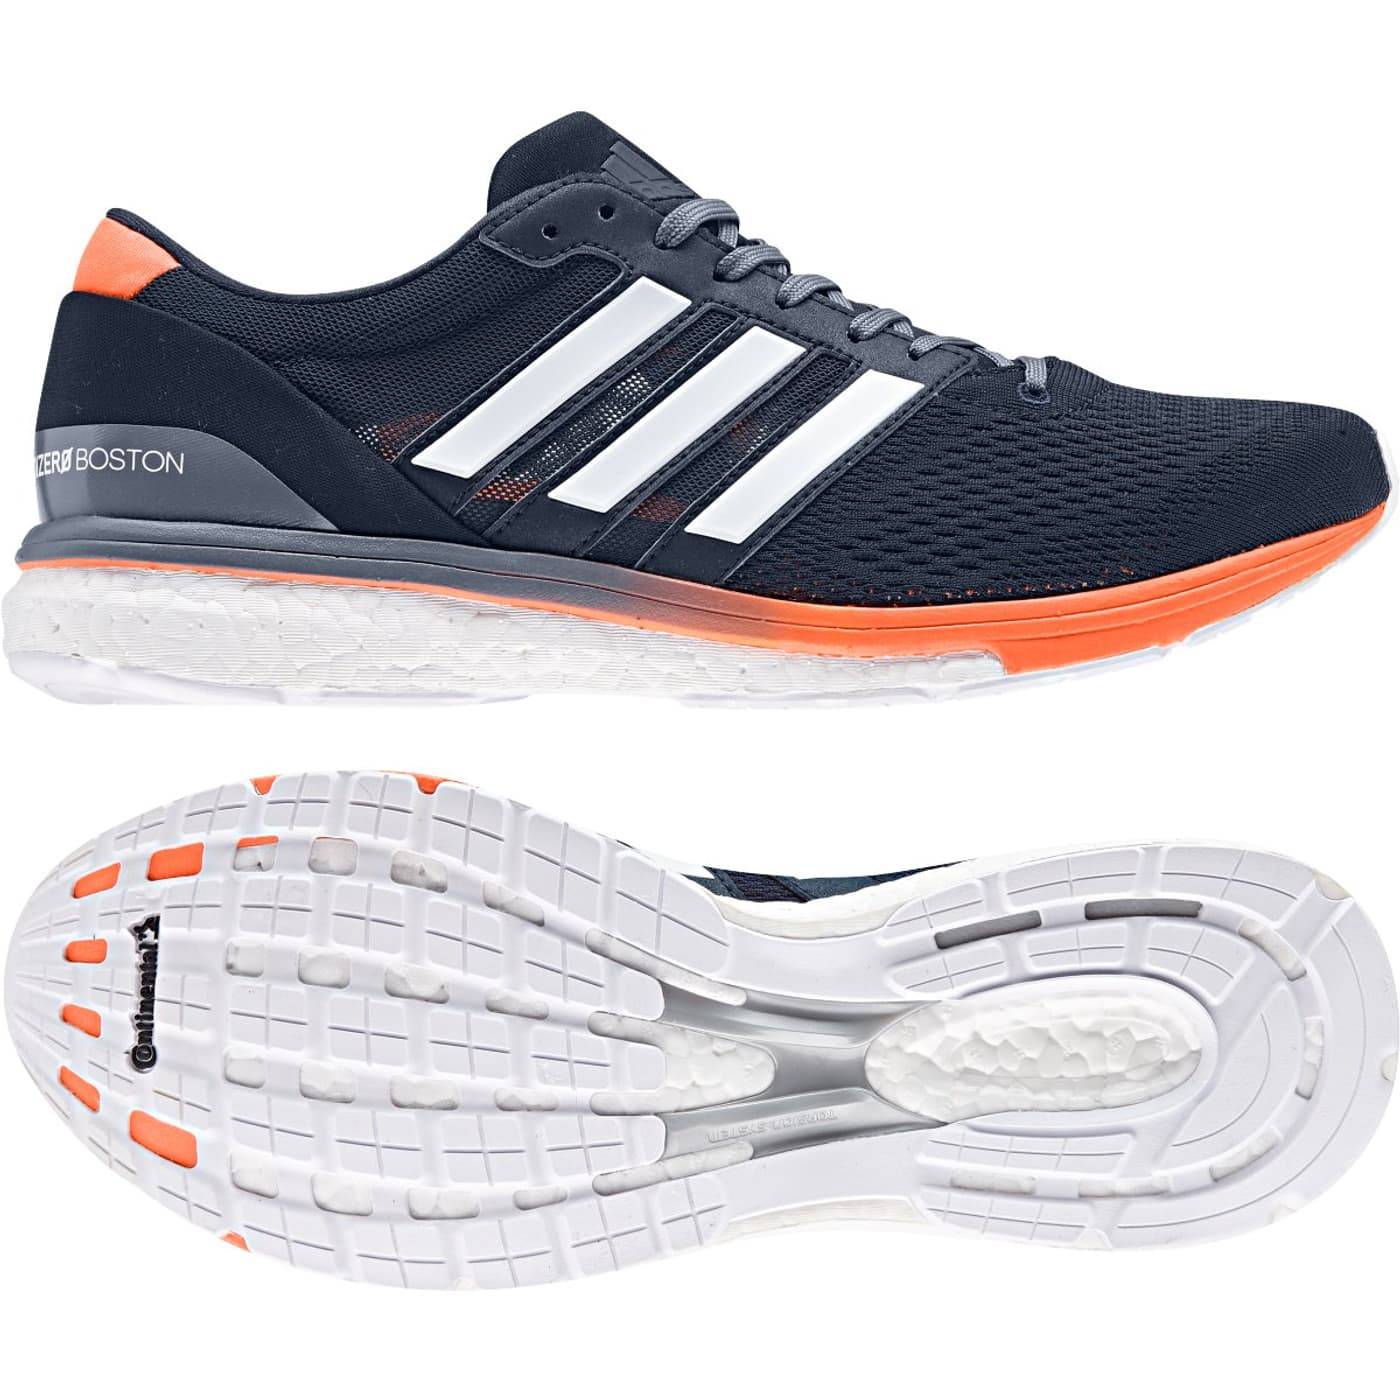 official photos e1dfe 84f9a ... Adidas Adizero Boston Boost 6 Chaussures de course pour homme